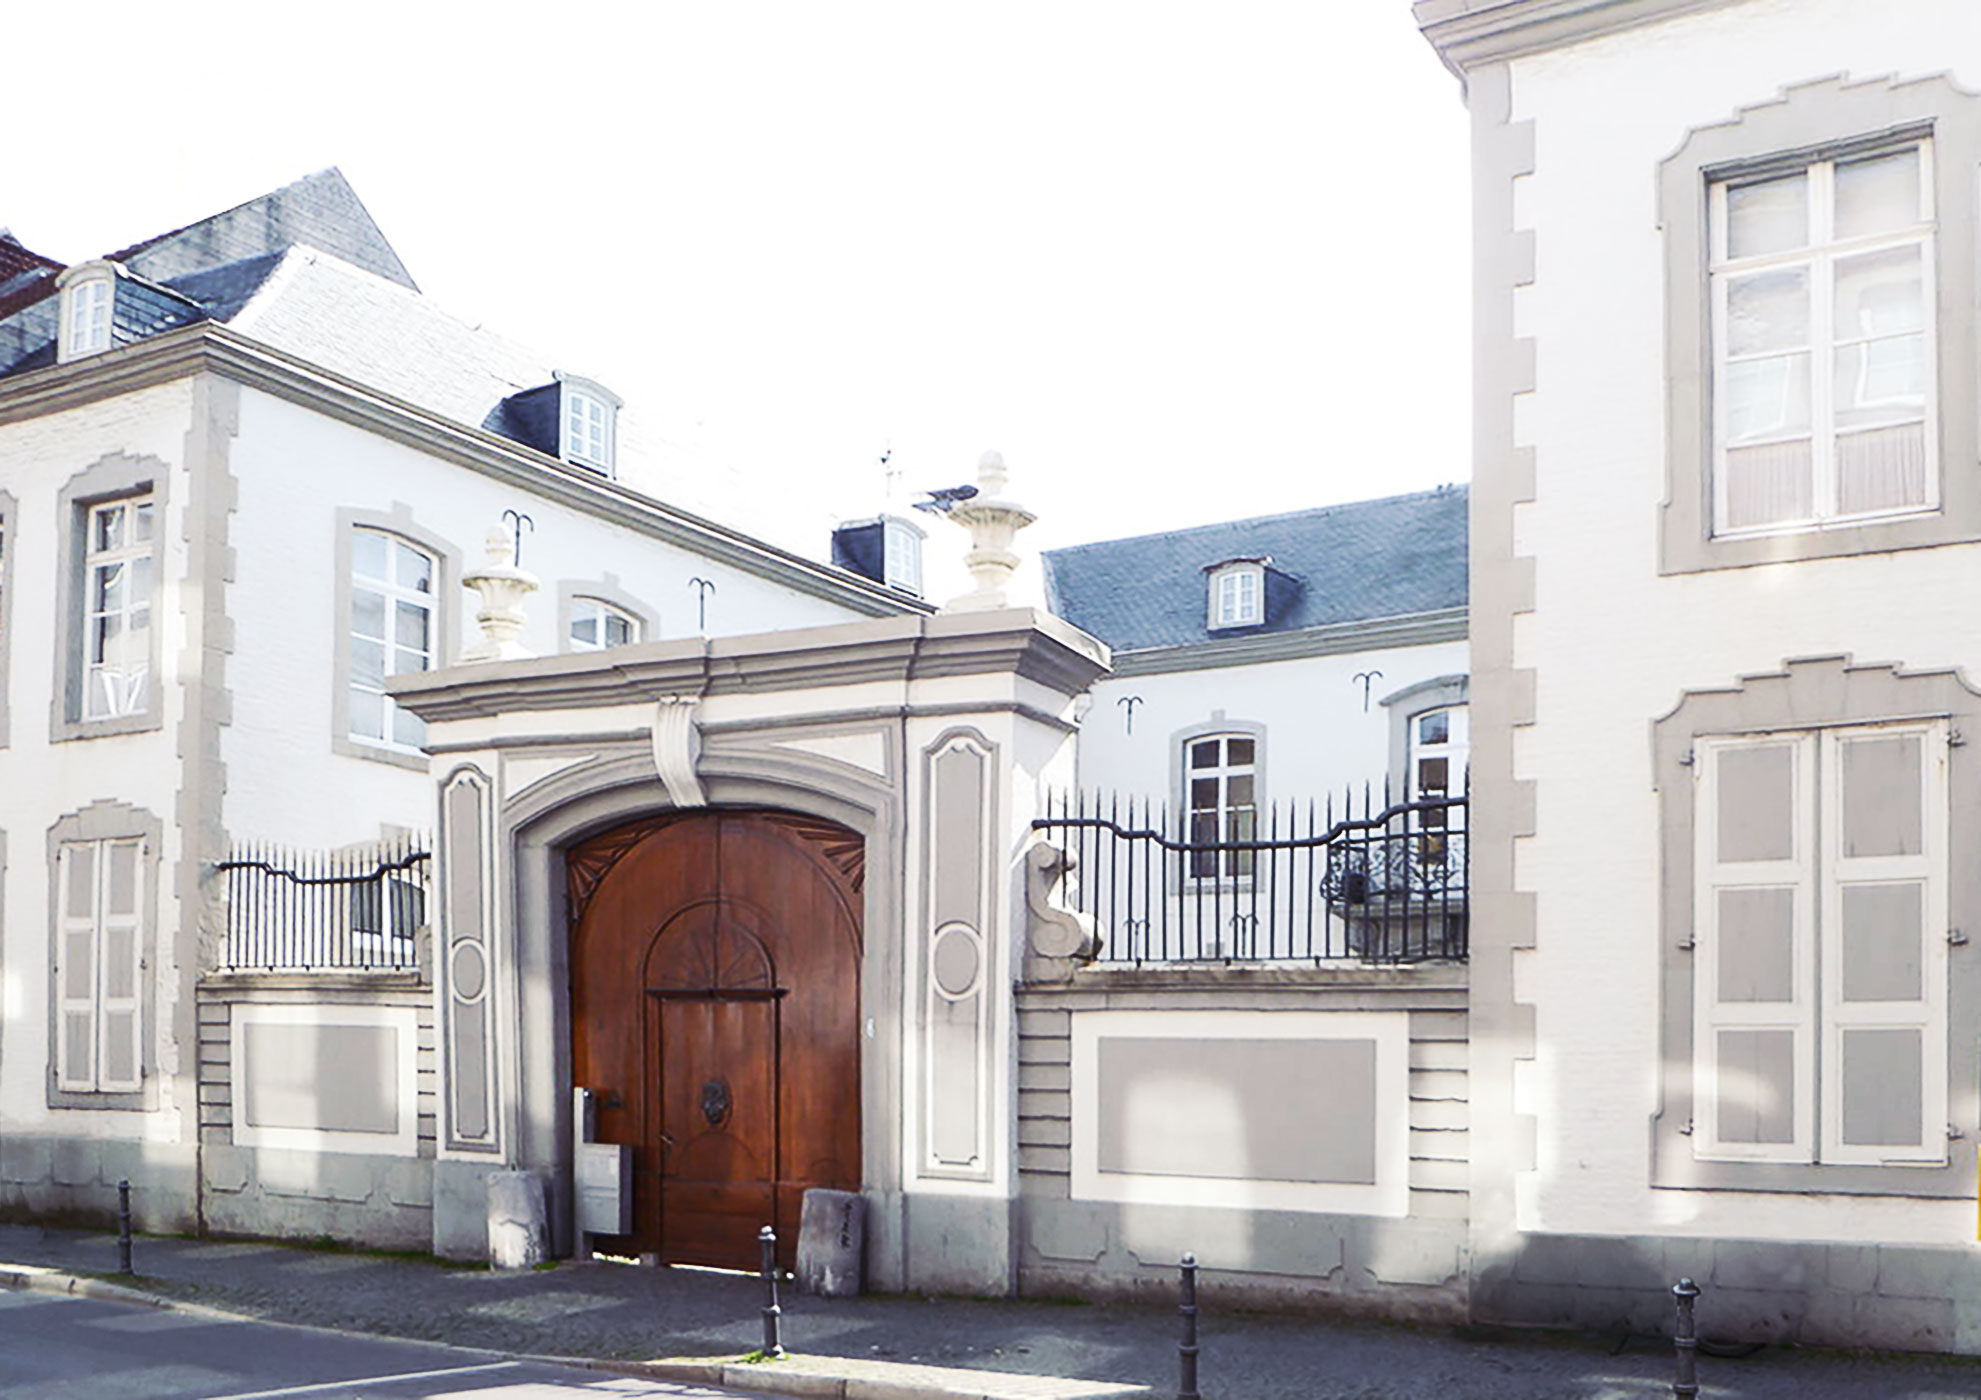 Aachen jkp - Architekten aachen ...